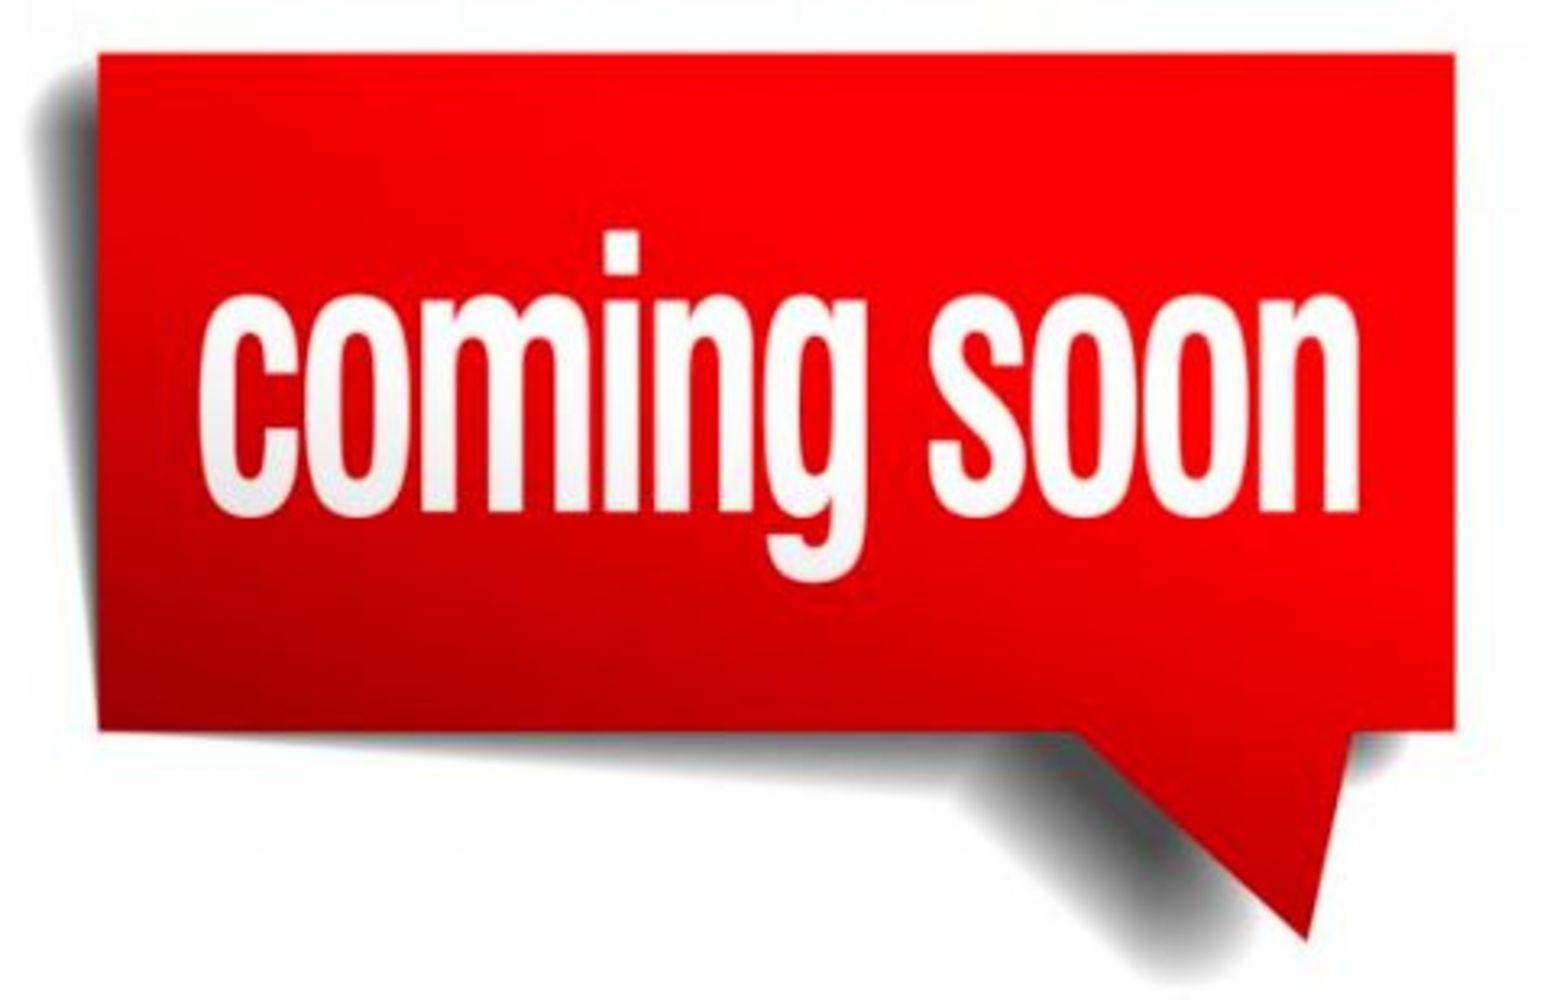 As New Branded Footwear, Adidas, Nike, Lacoste, Under Armour, New Balance, Reebok, Puma, Kickers, Ralph Lauren, Skechers, Tommy Hilfiger, Gola, Rockport, K-Swiss, Ellesse, Penguin, Jack & Jones, Vans